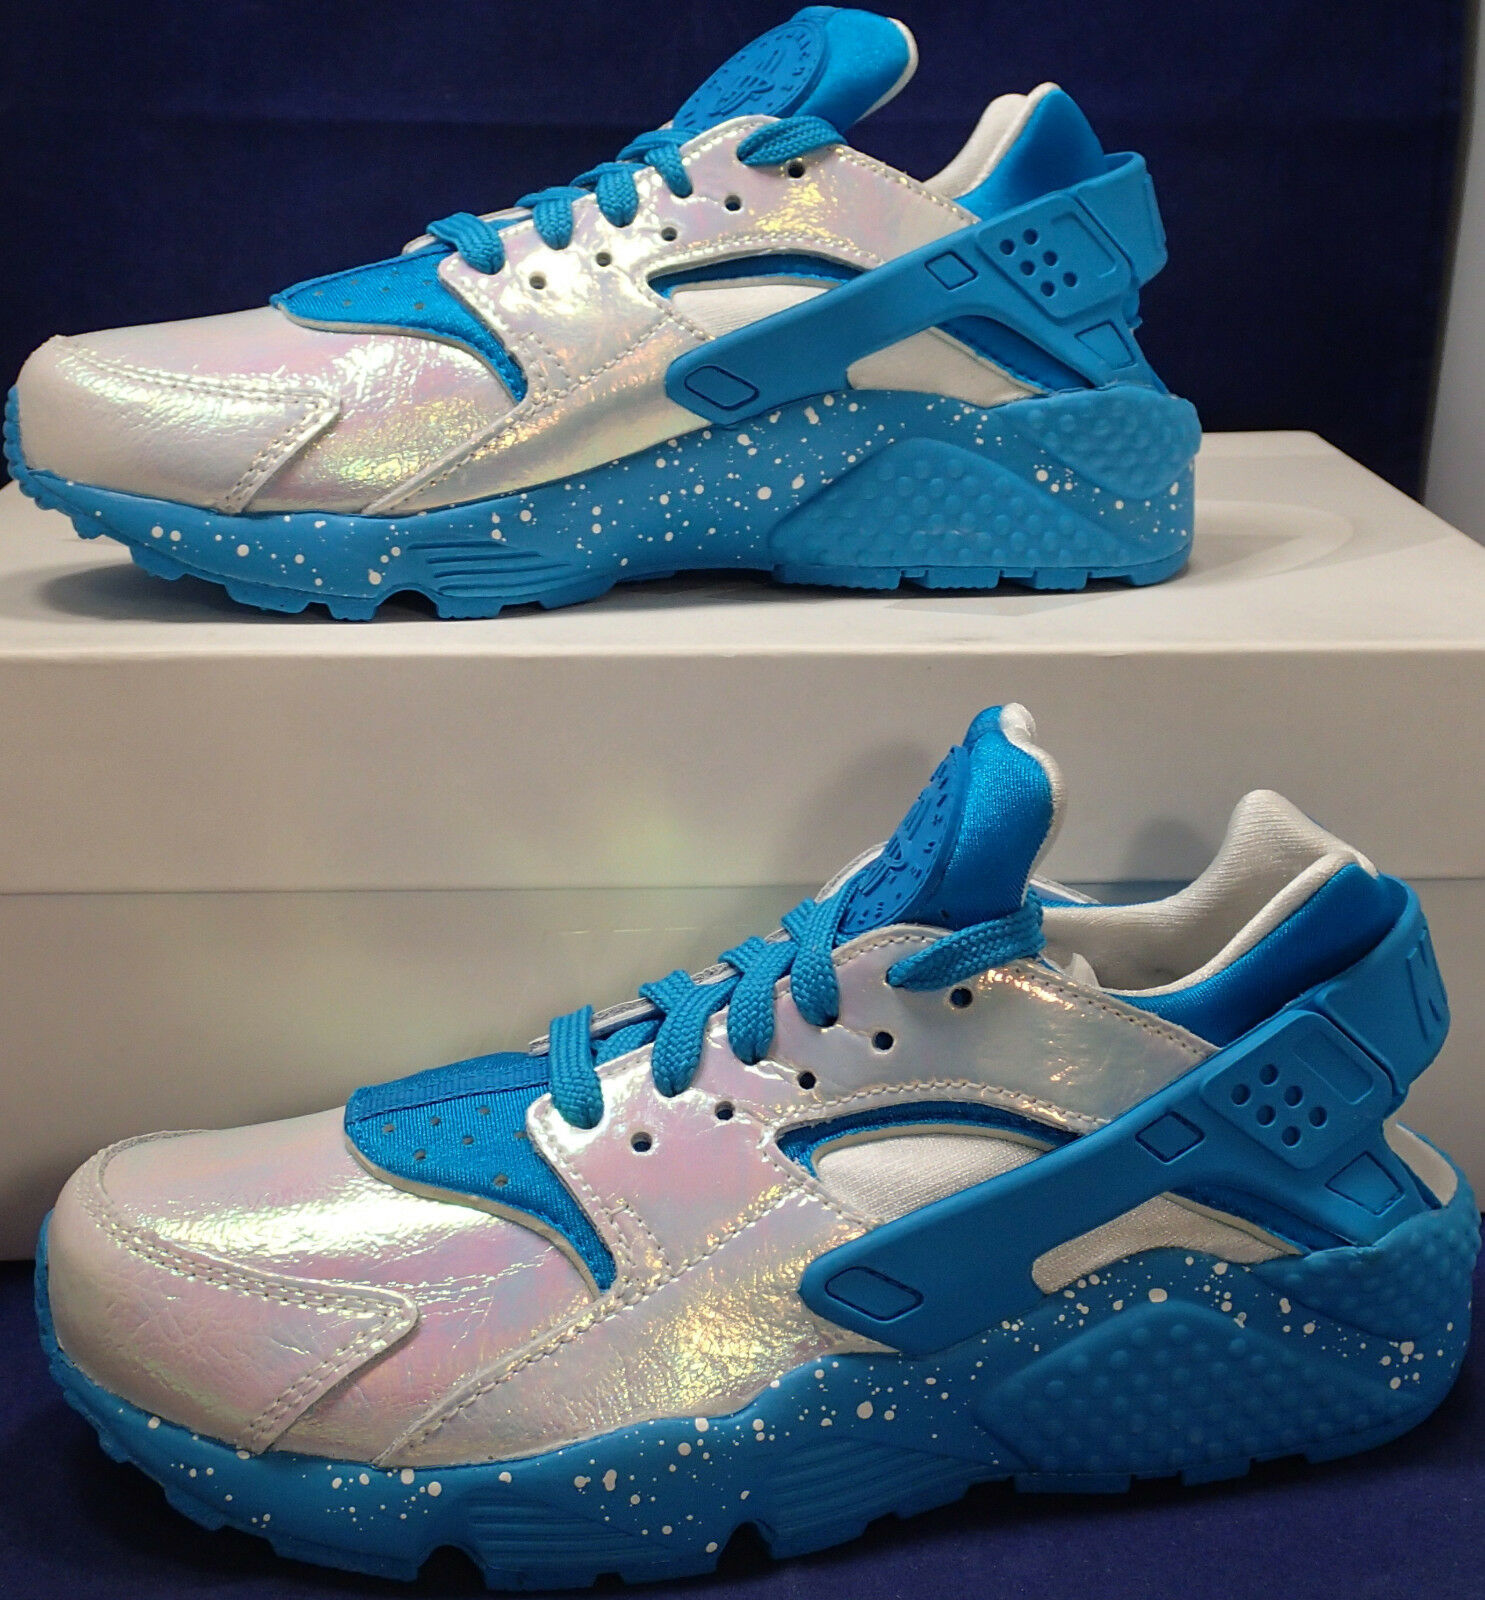 Womens Nike Air Huarache Run iD Iridescent Chlorine bluee SZ 6 ( 871141-991 )